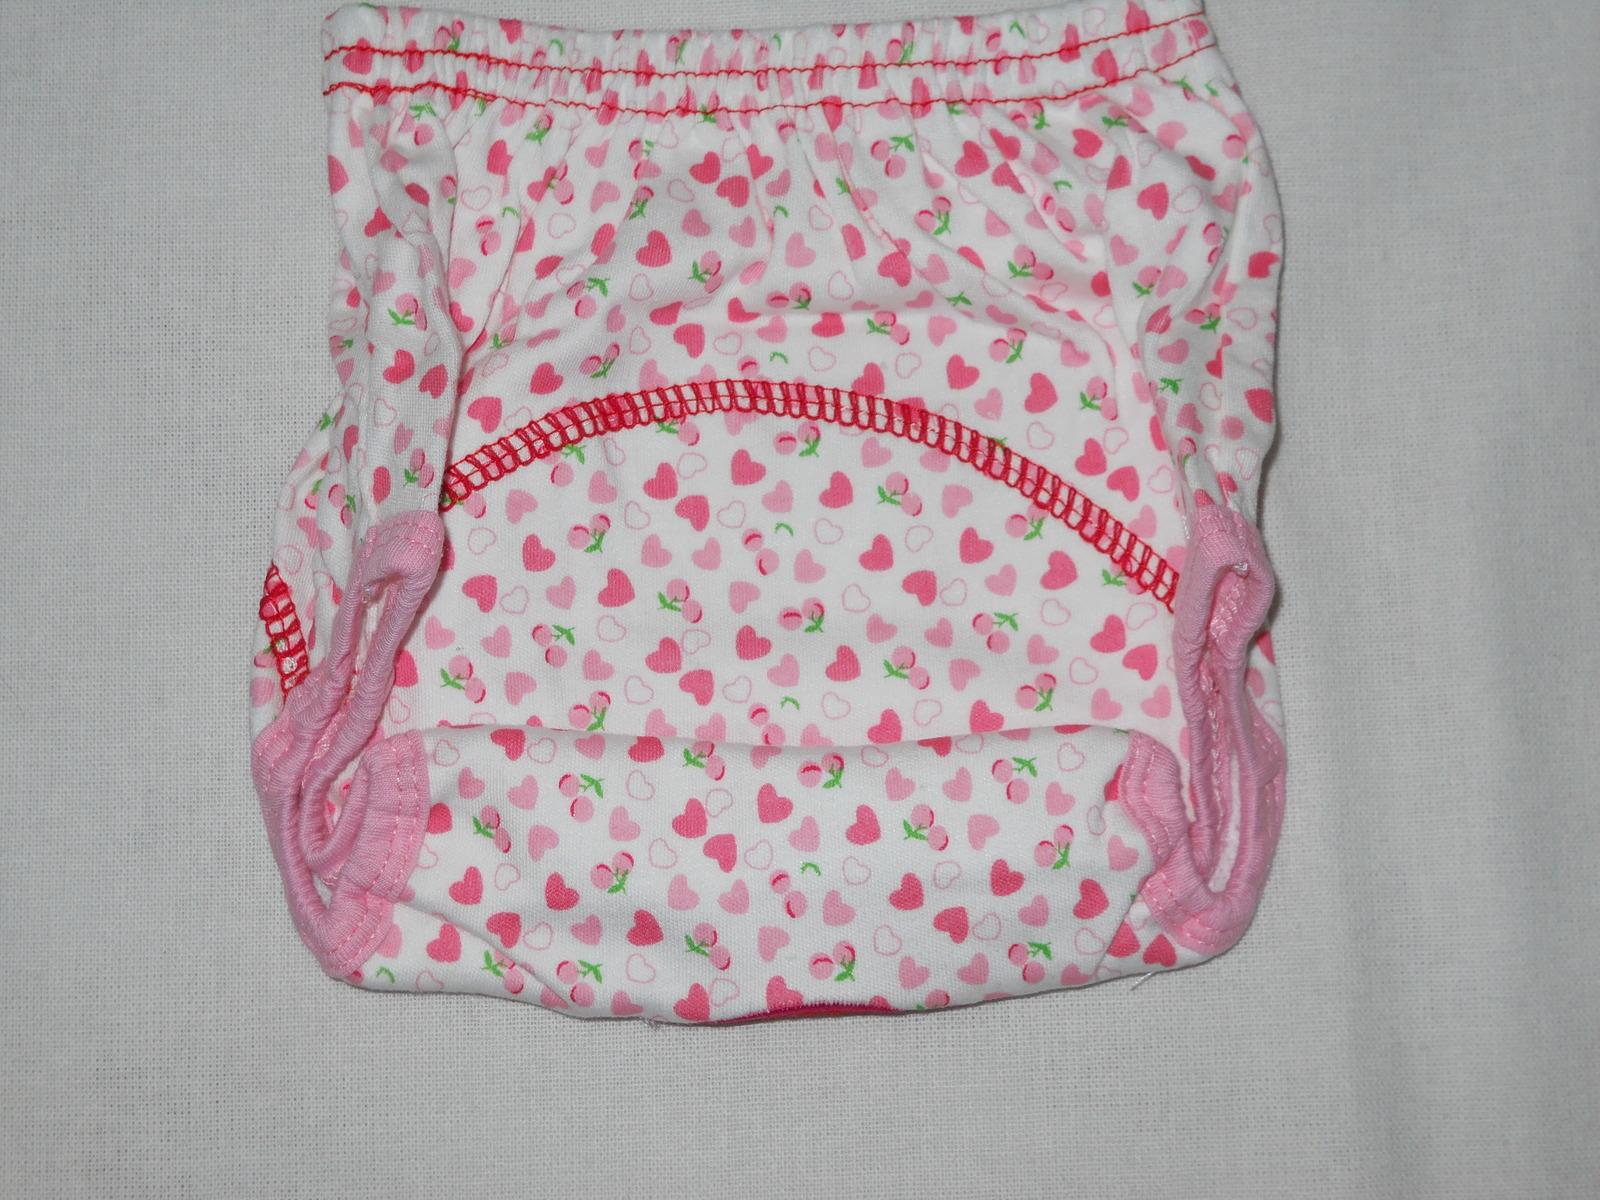 GVESS Set of 3 Baby Toddler Girls Potty Training Pants Reusable Size Medium